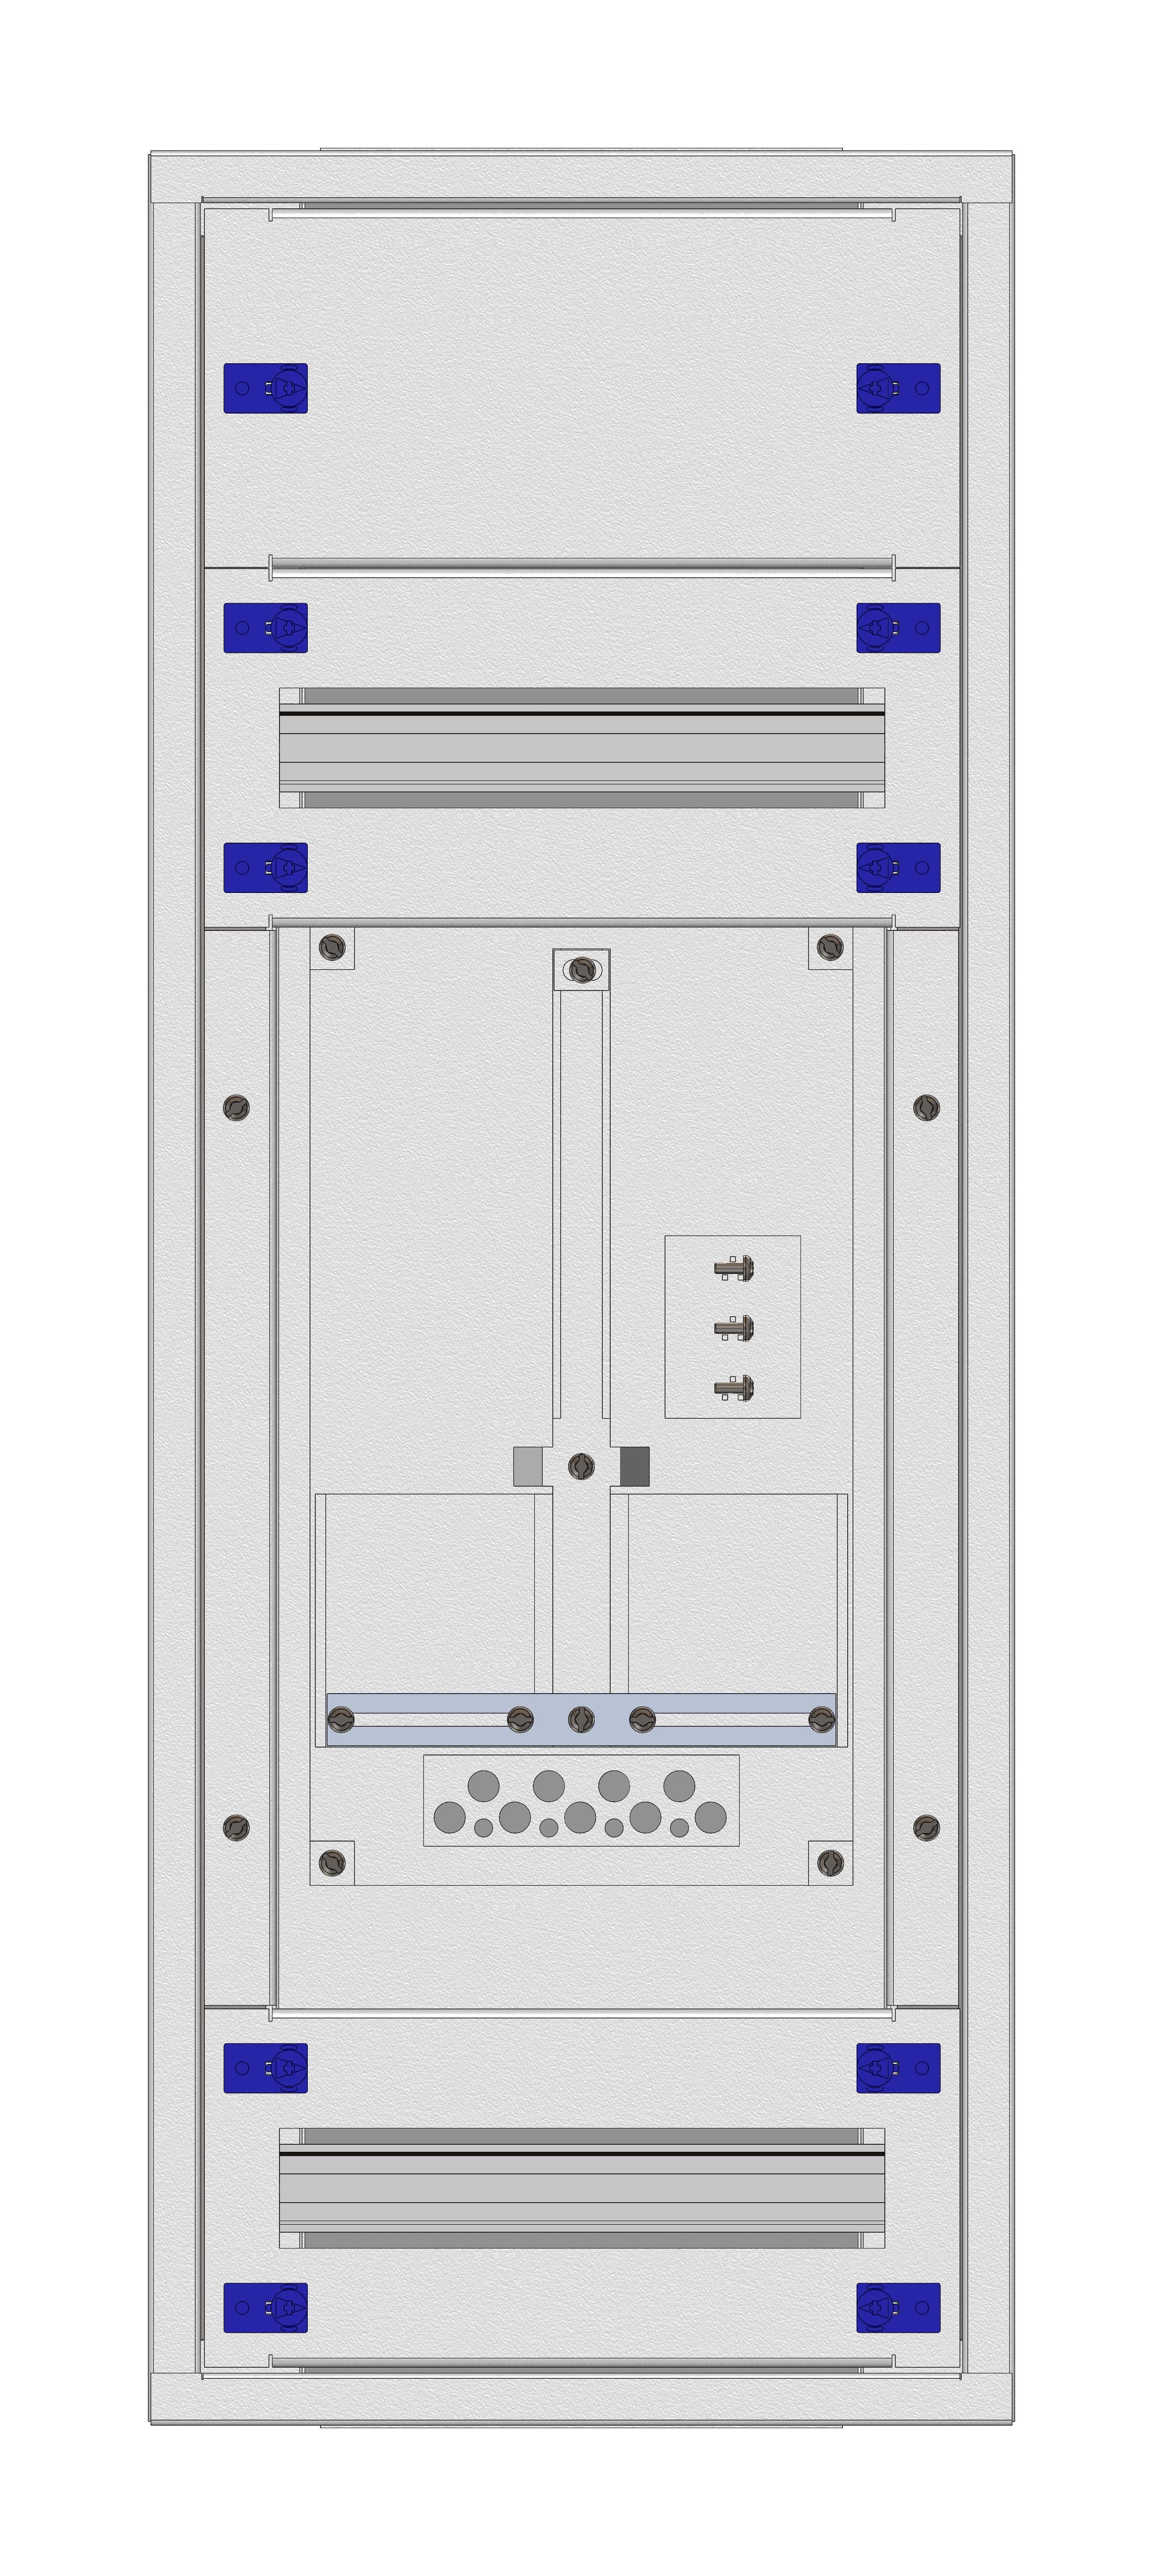 1 Stk Aufputz-Zählerverteiler 1A-18E/VBG 1ZP, H915B380T250mm IL160118VS